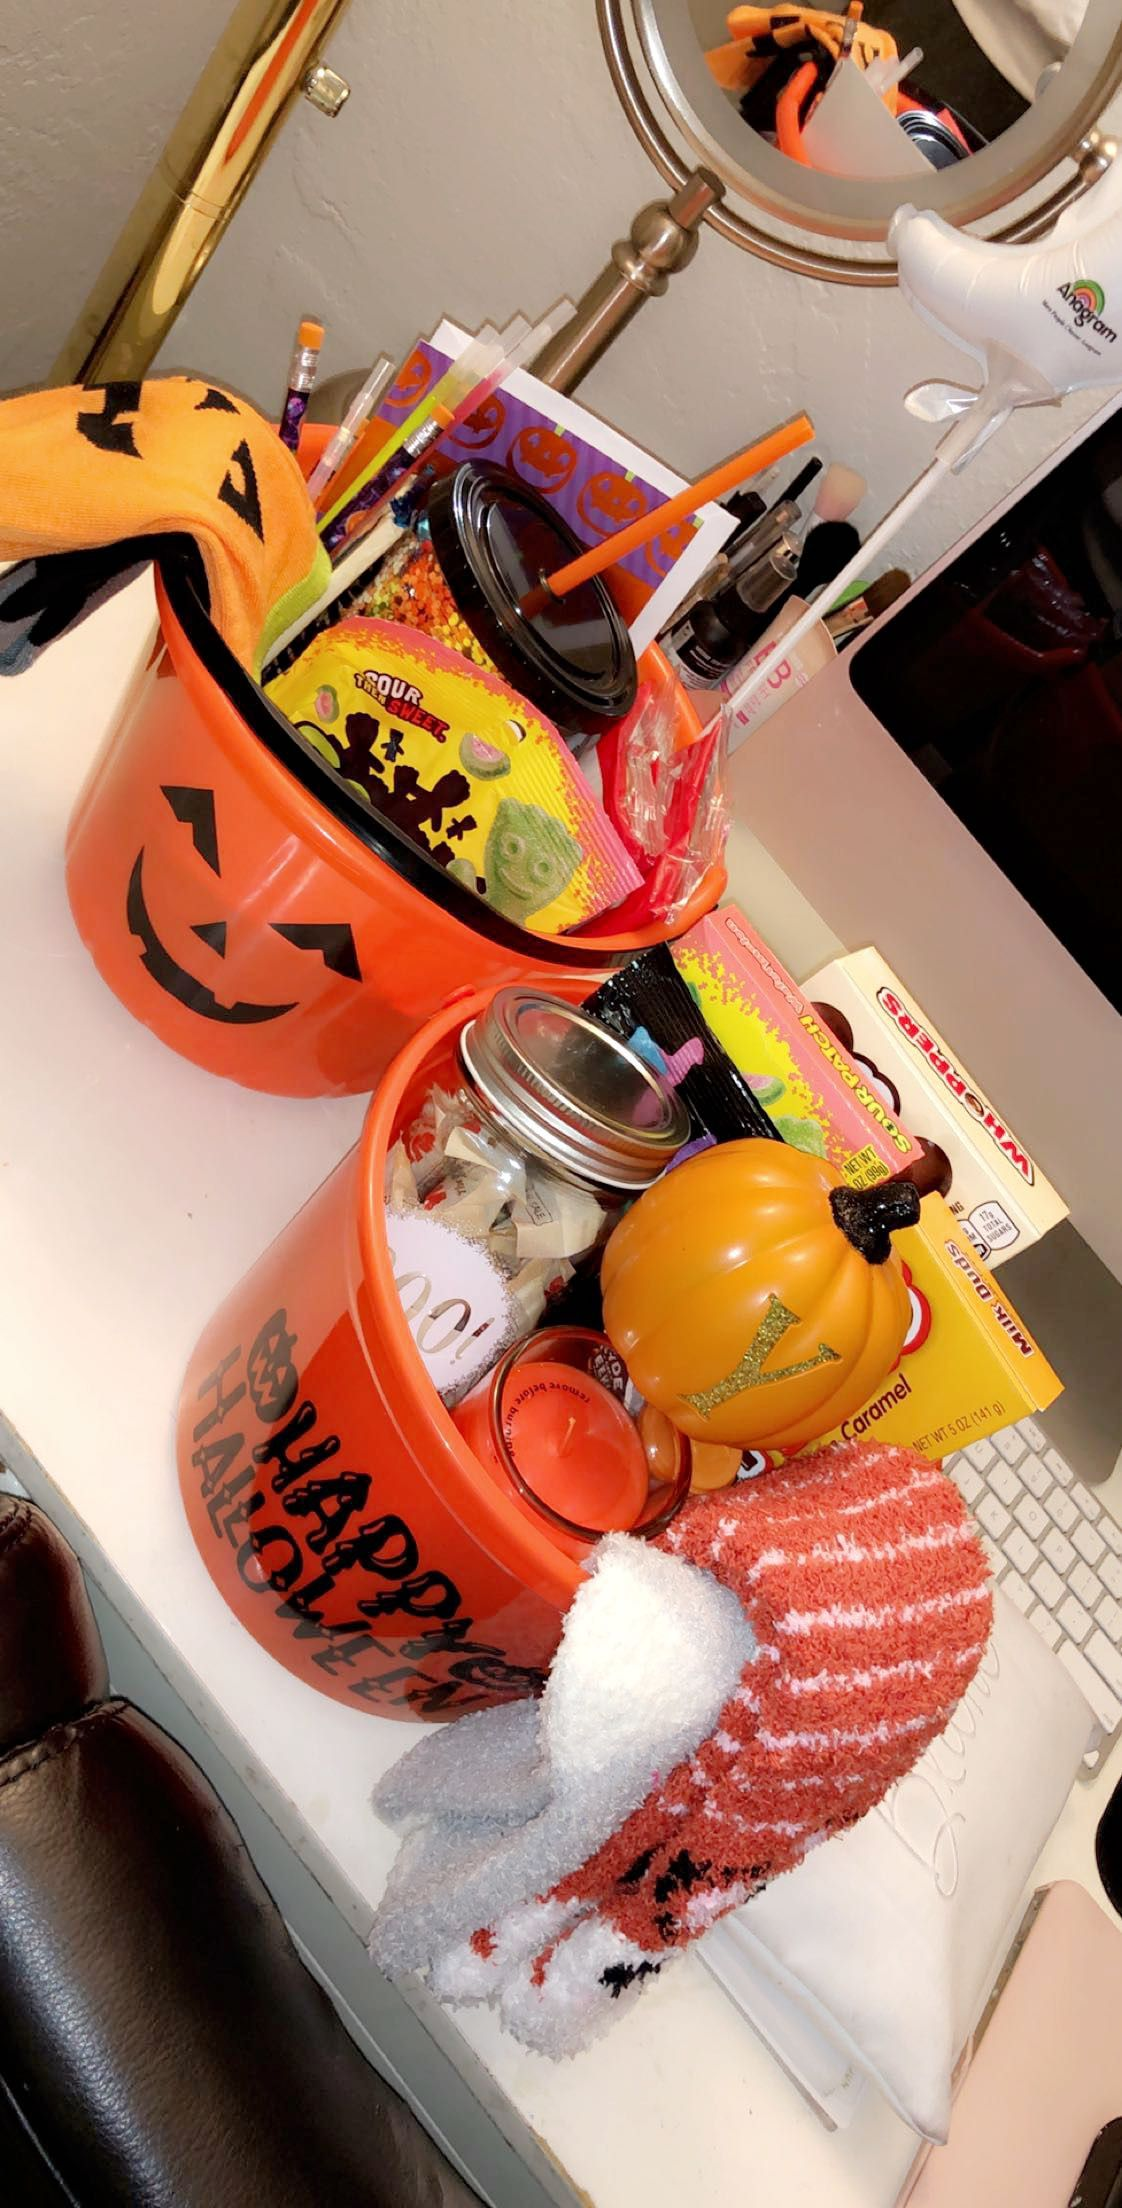 Spooky halloween gift baskets